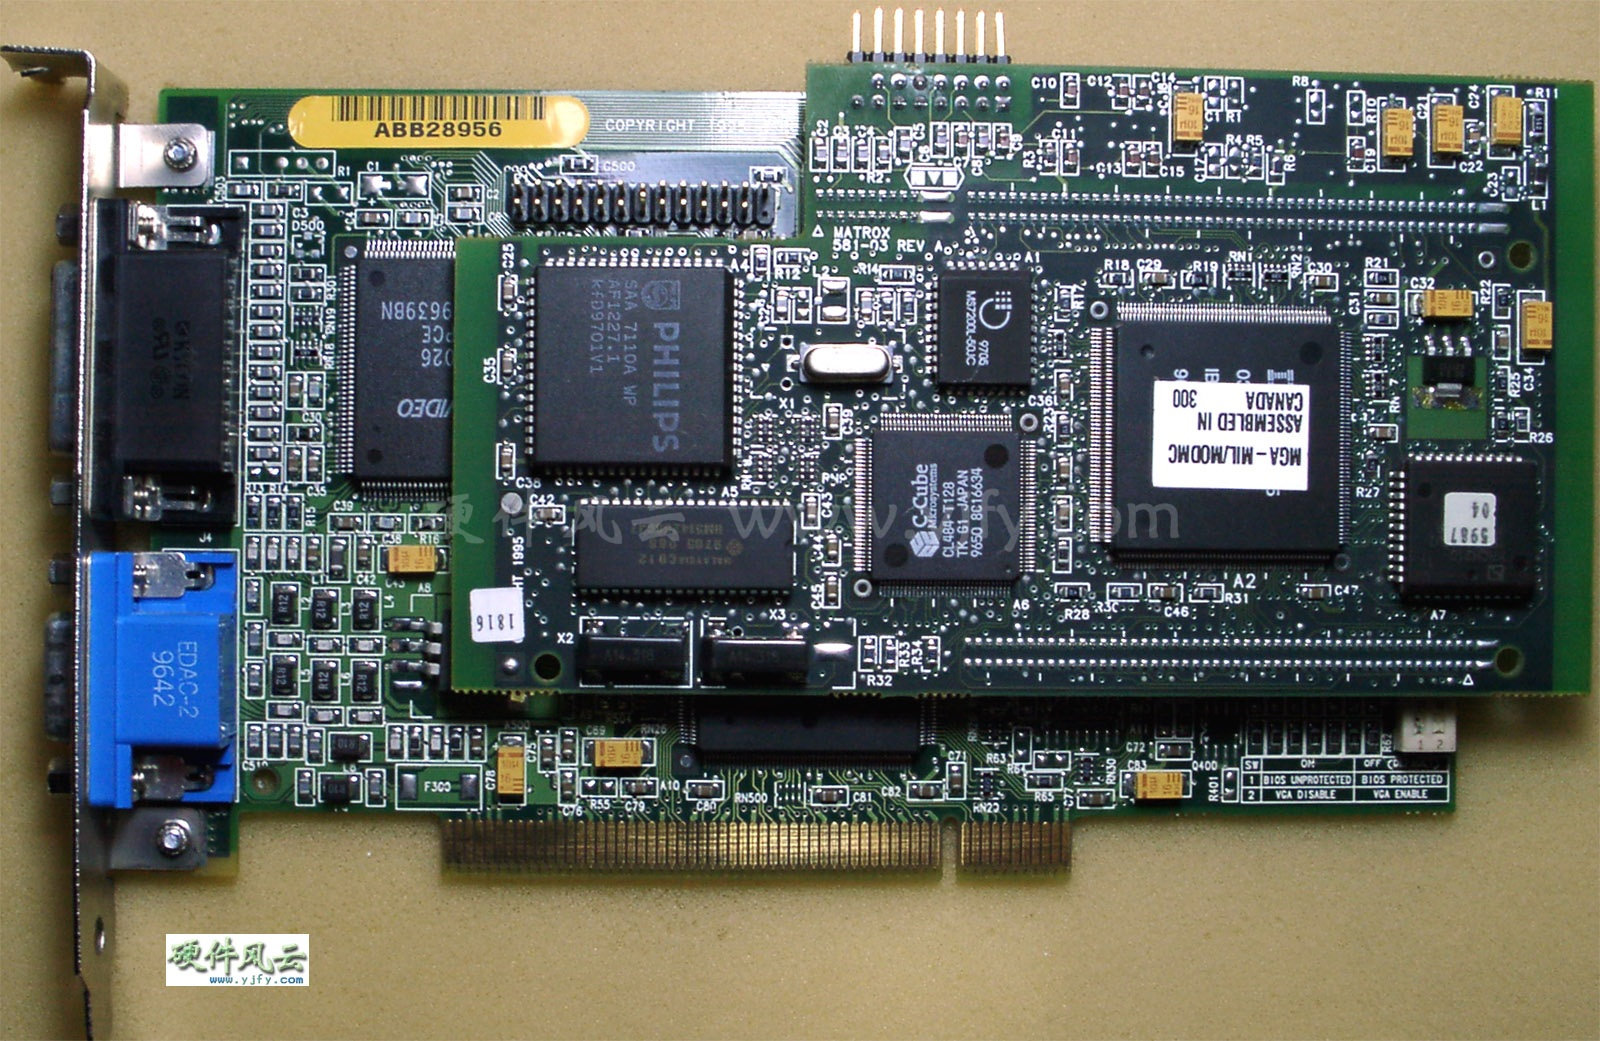 G2+//SD//MOD8 MATROX G2+//SD//MOD8 MATROX G2+//SD//MOD8